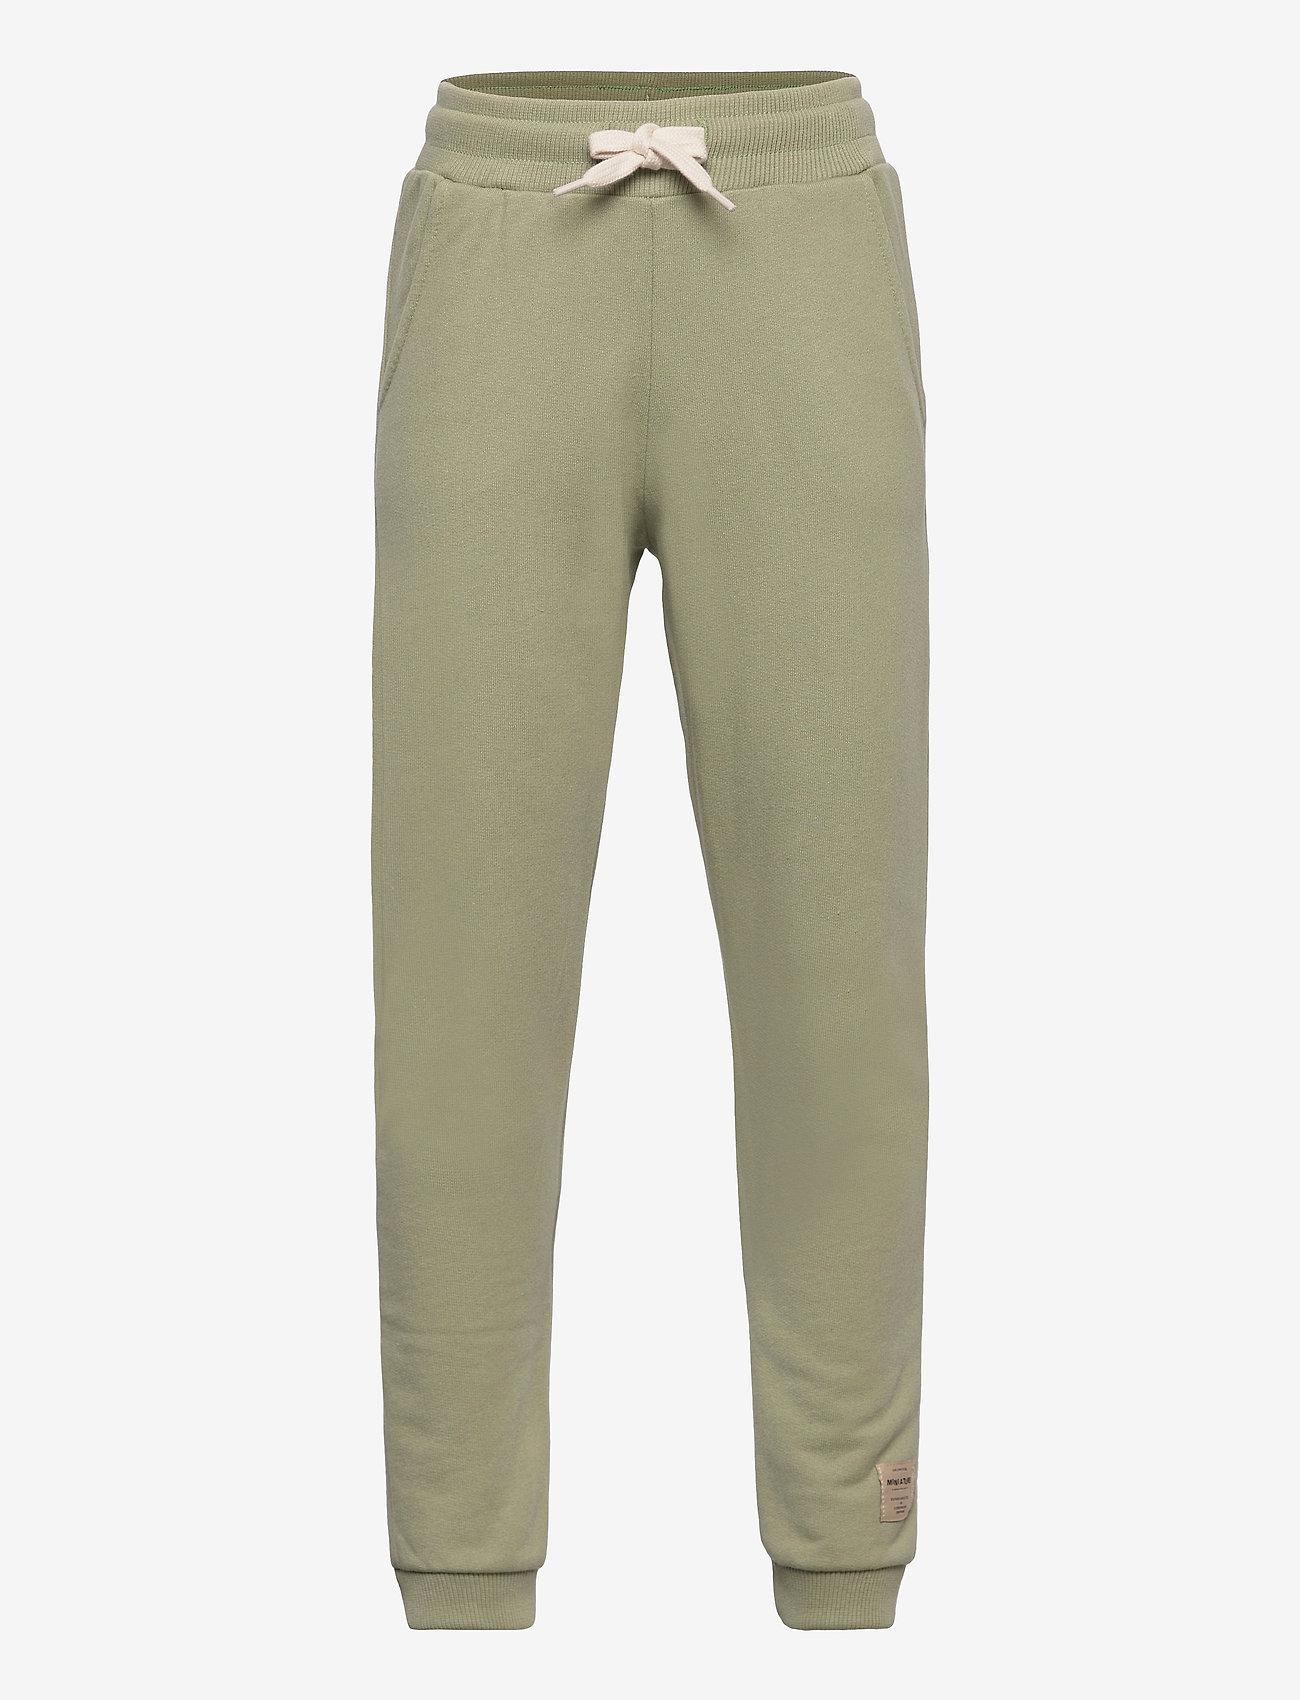 Mini A Ture - Even pants, K - sweatpants - oil green - 0